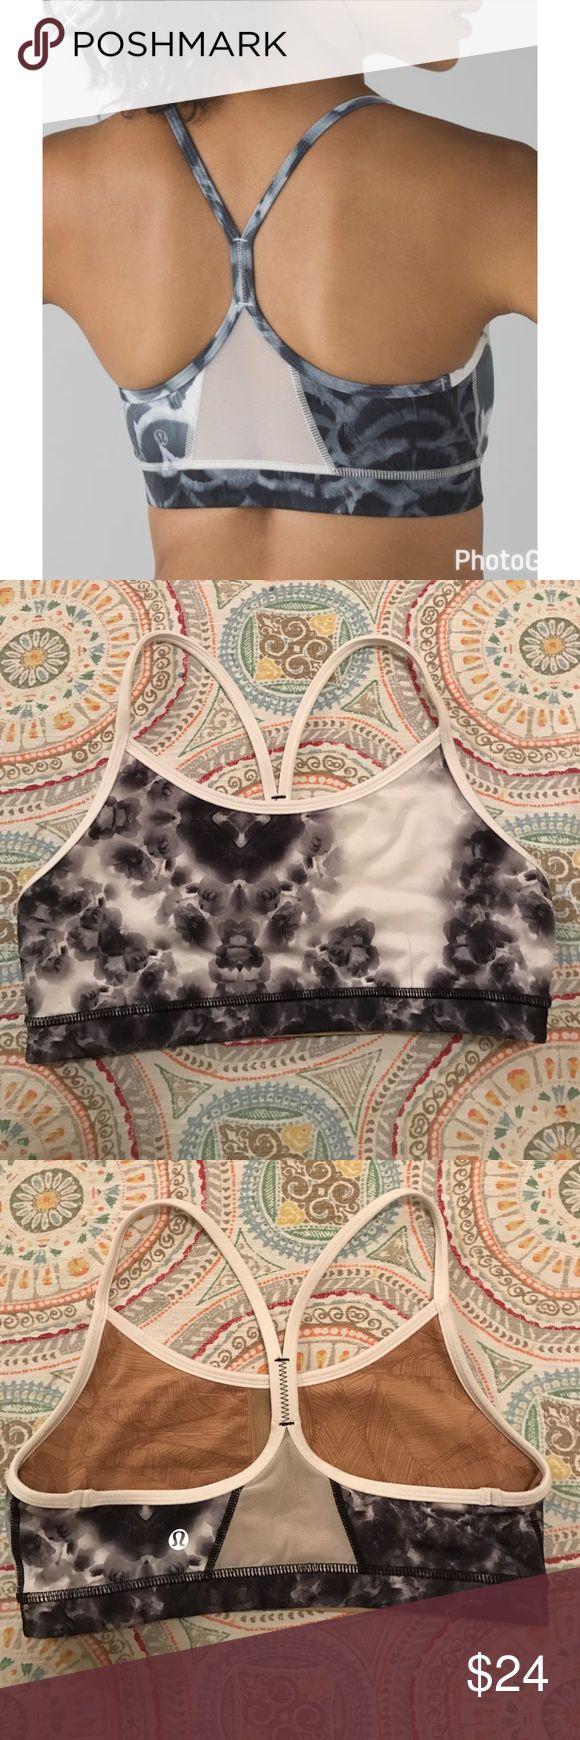 Lululemon Power Flow Y Bra Size 6 EUC. Missing removable bra pads. Print is different than stock photo. lululemon athletica Intimates & Sleepwear Bras